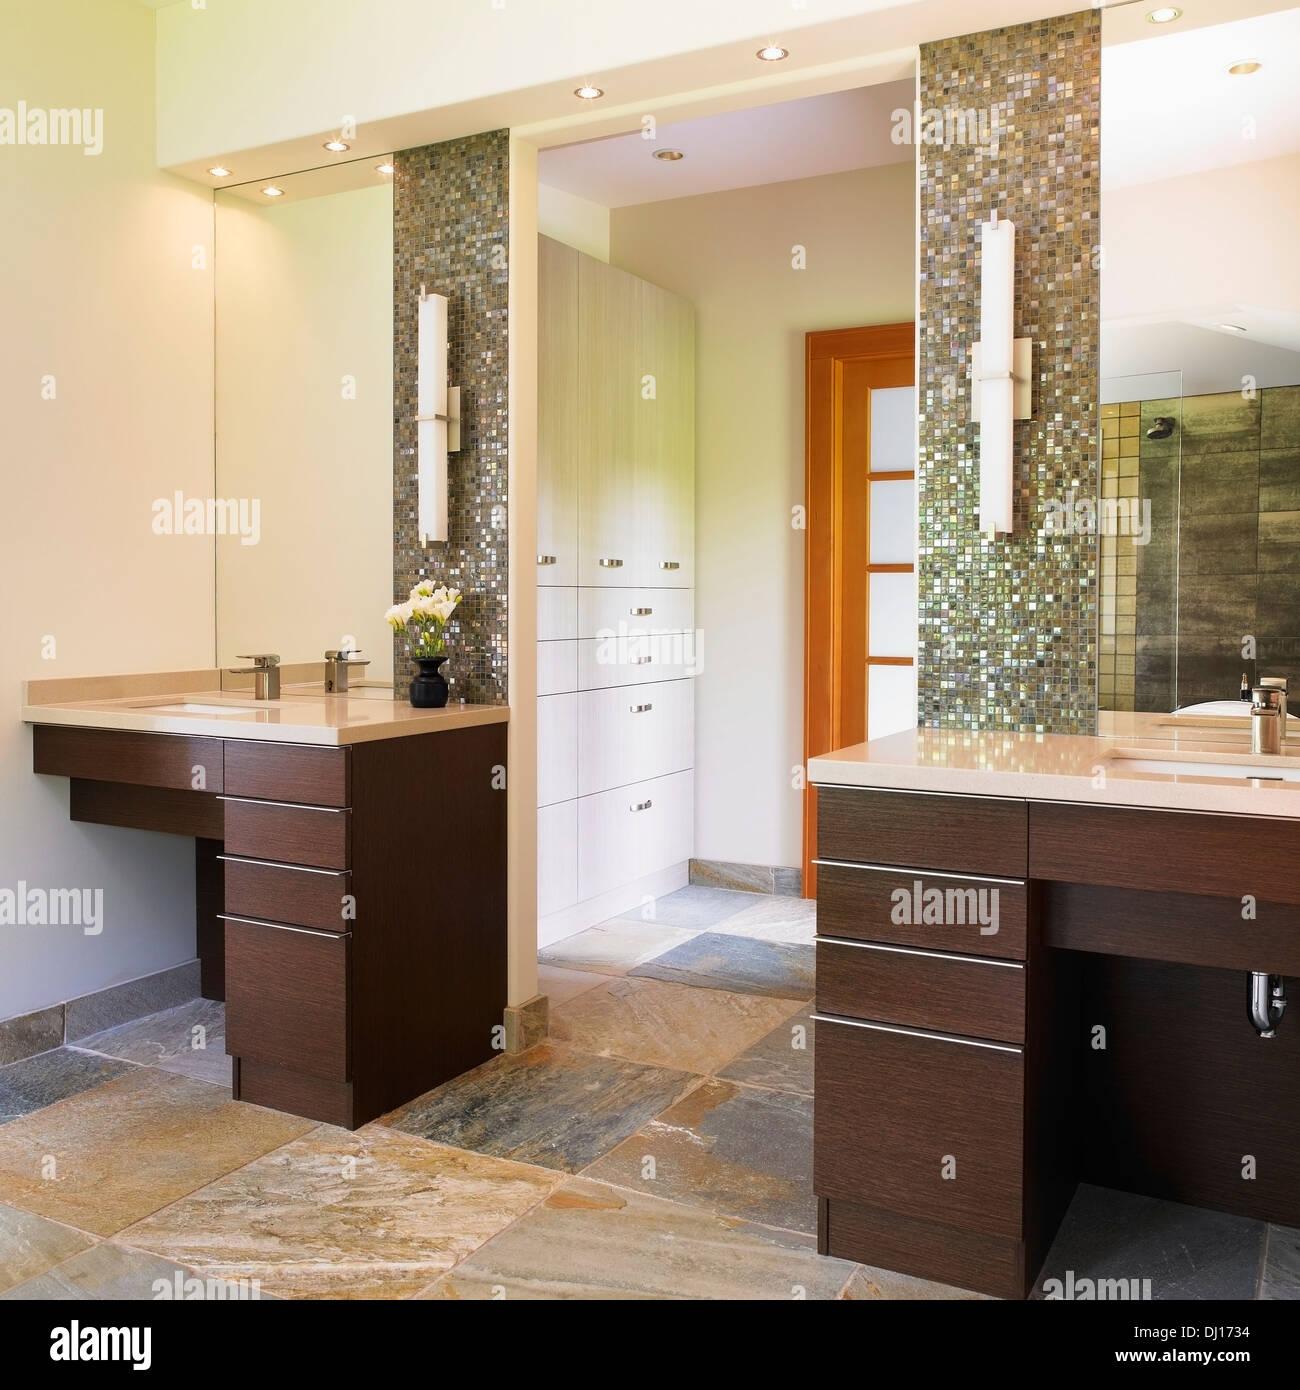 Master Bathroom With 2 Vanities Leading Into Walk-In Closet ... on master suite closet design, mud room closet design, entry closet design, small bedroom closet design, foyer closet design,